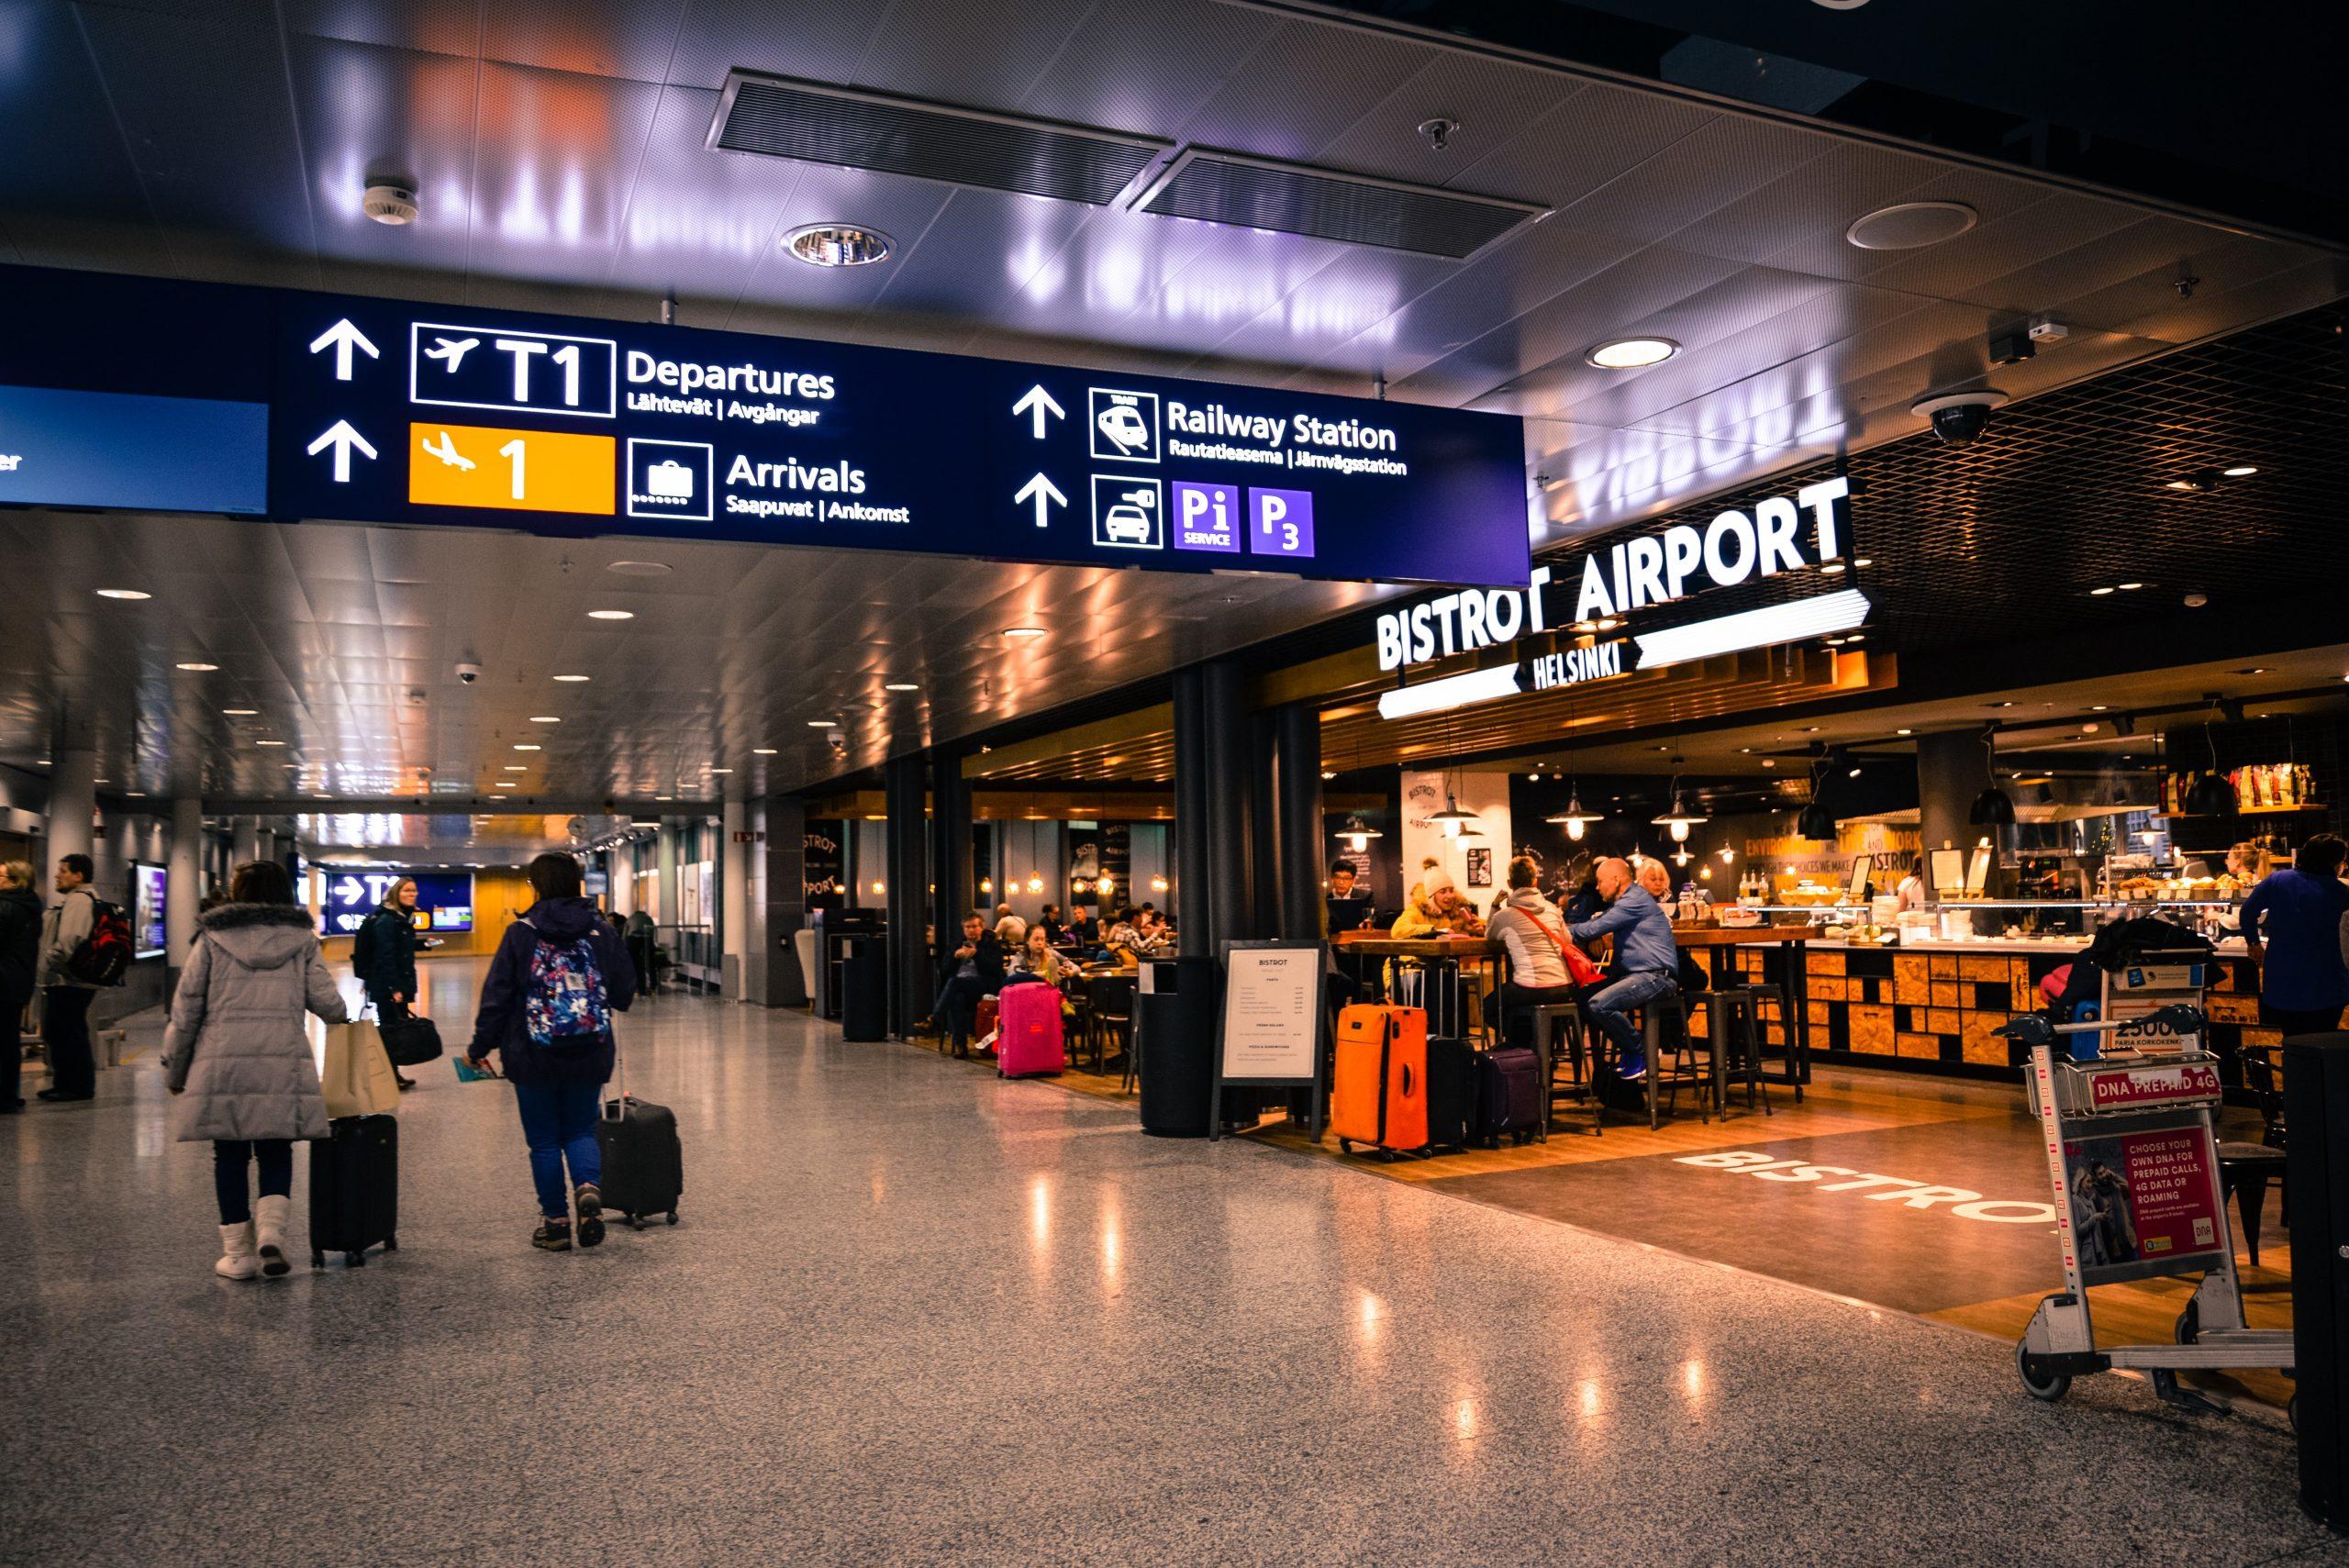 transfert aeroport - chauffeur vtc - bandrive